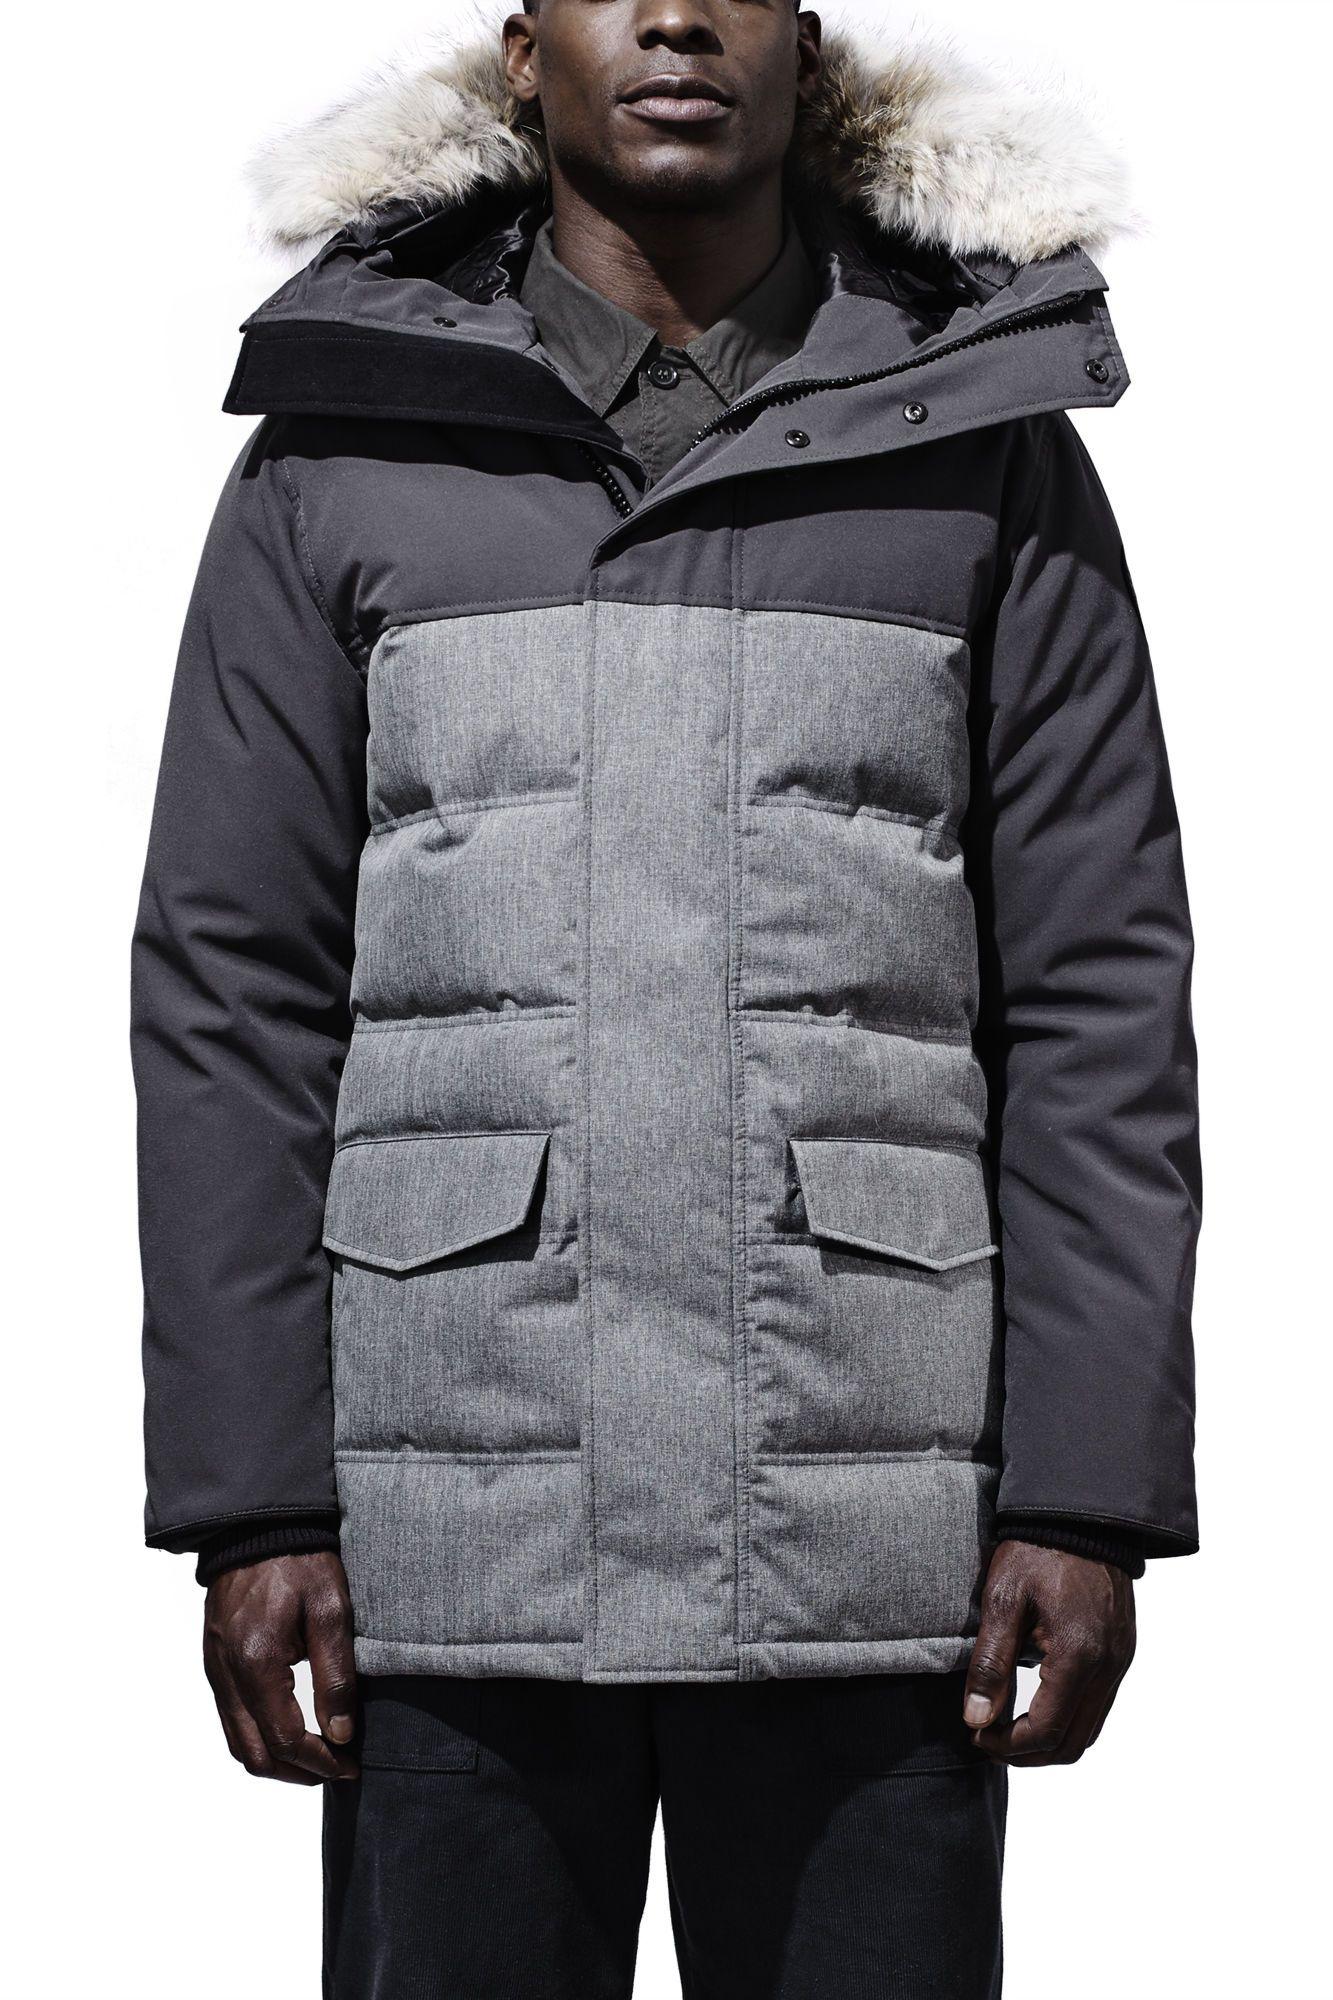 Clarence Coat Black Label Black Coat Black Label Coat Design